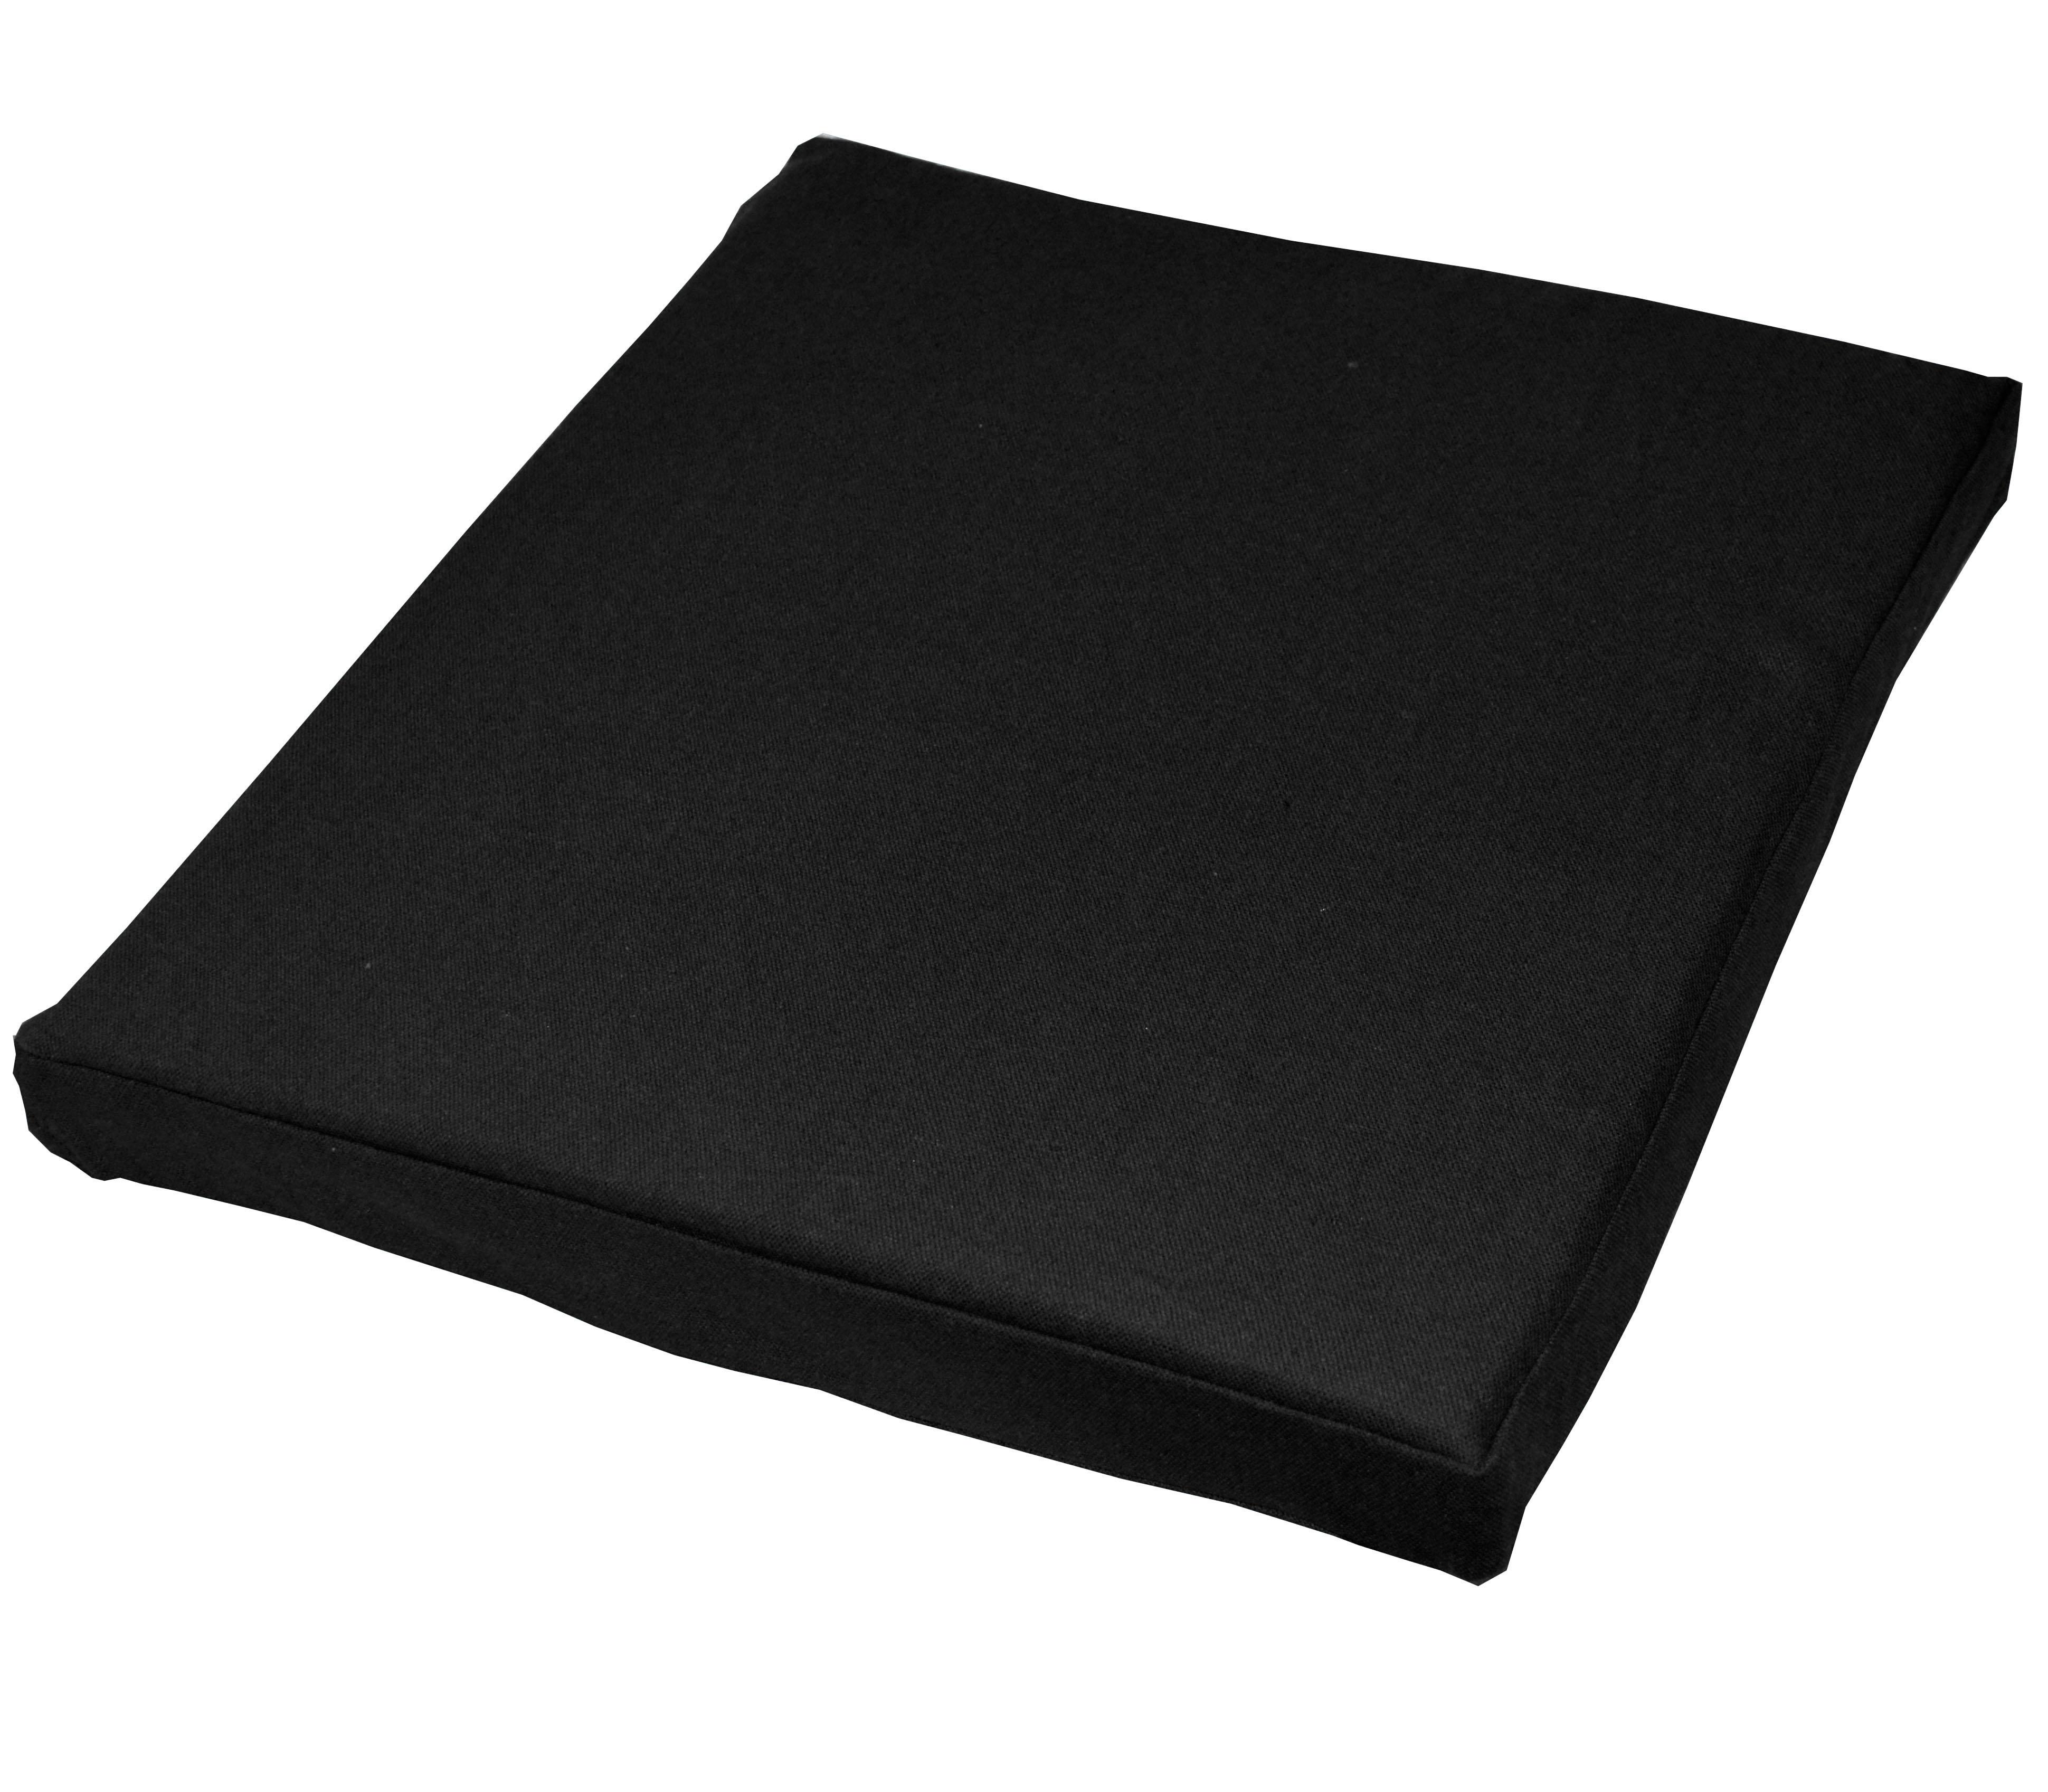 black cotton chair covers accessories in chennai aa152t plain thick canvas 3d box sofa seat